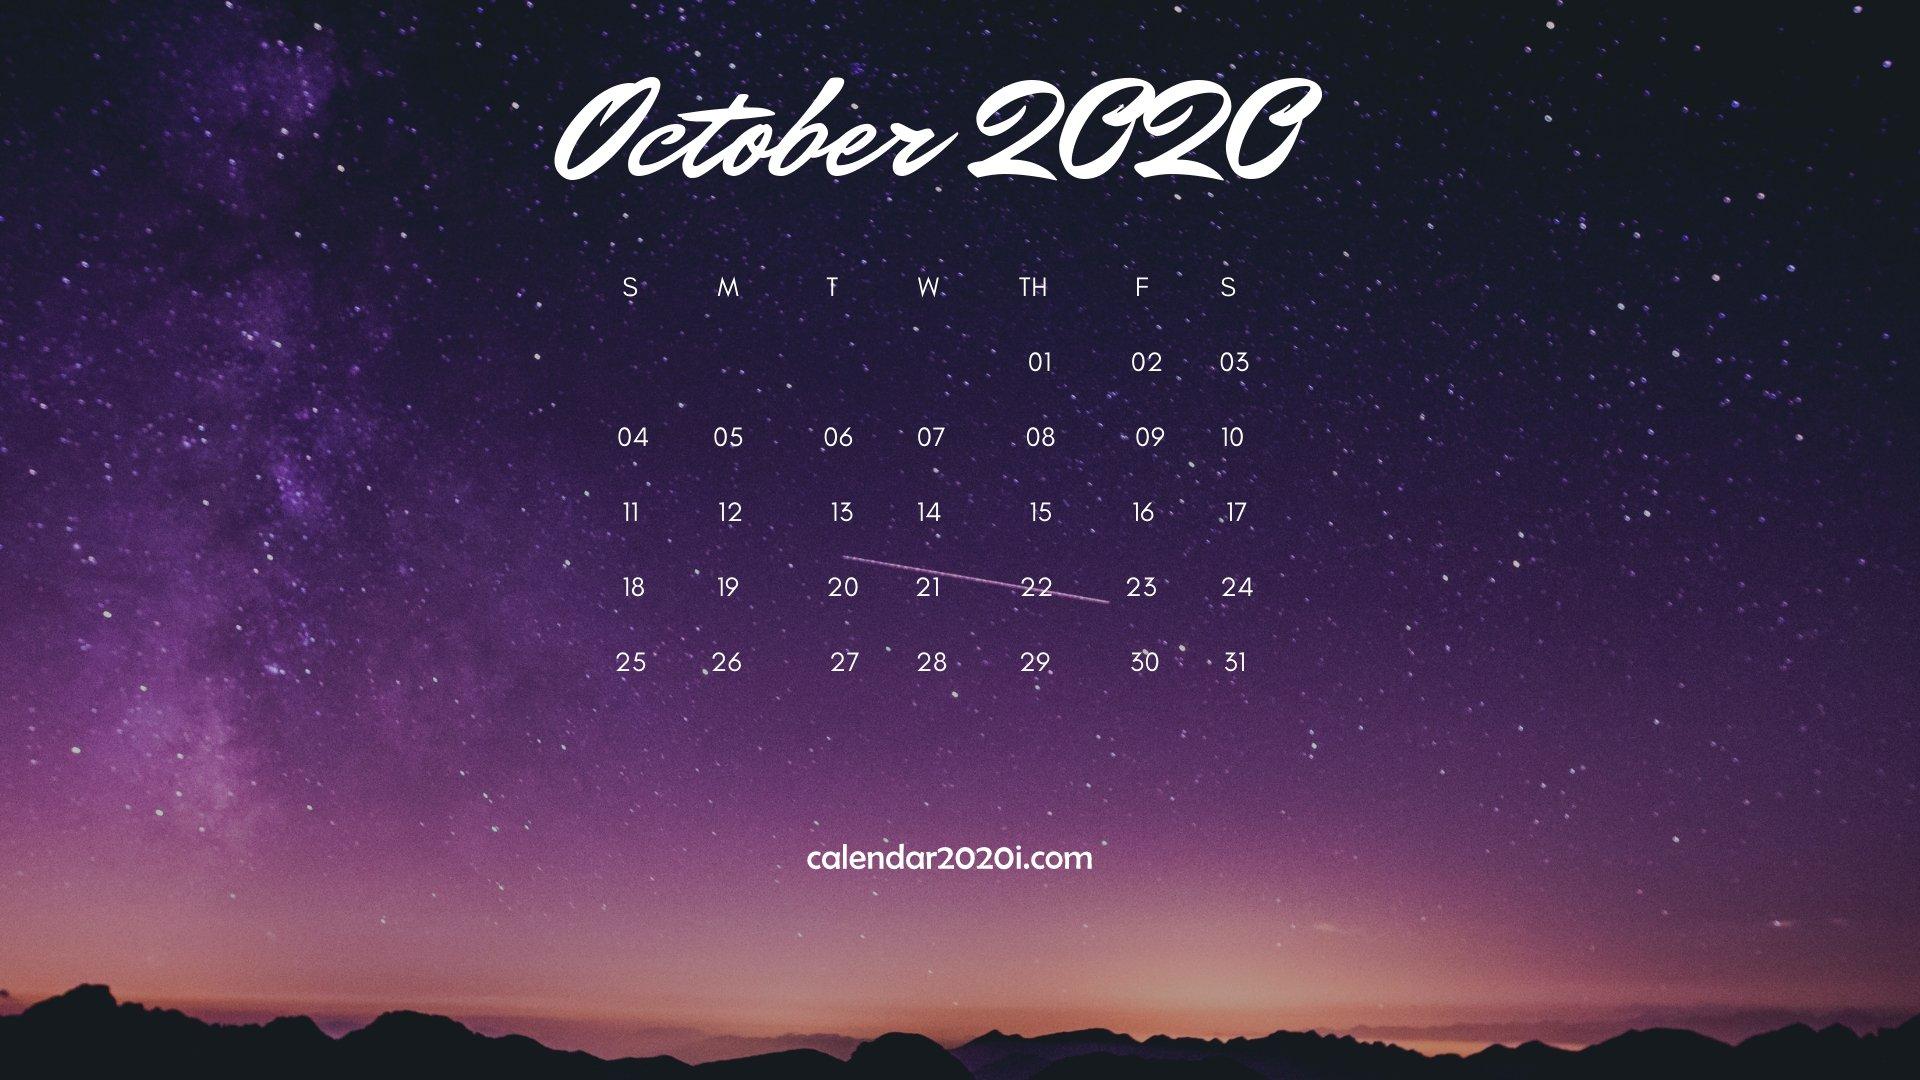 October 2020 Calendar Desktop Wallpaper